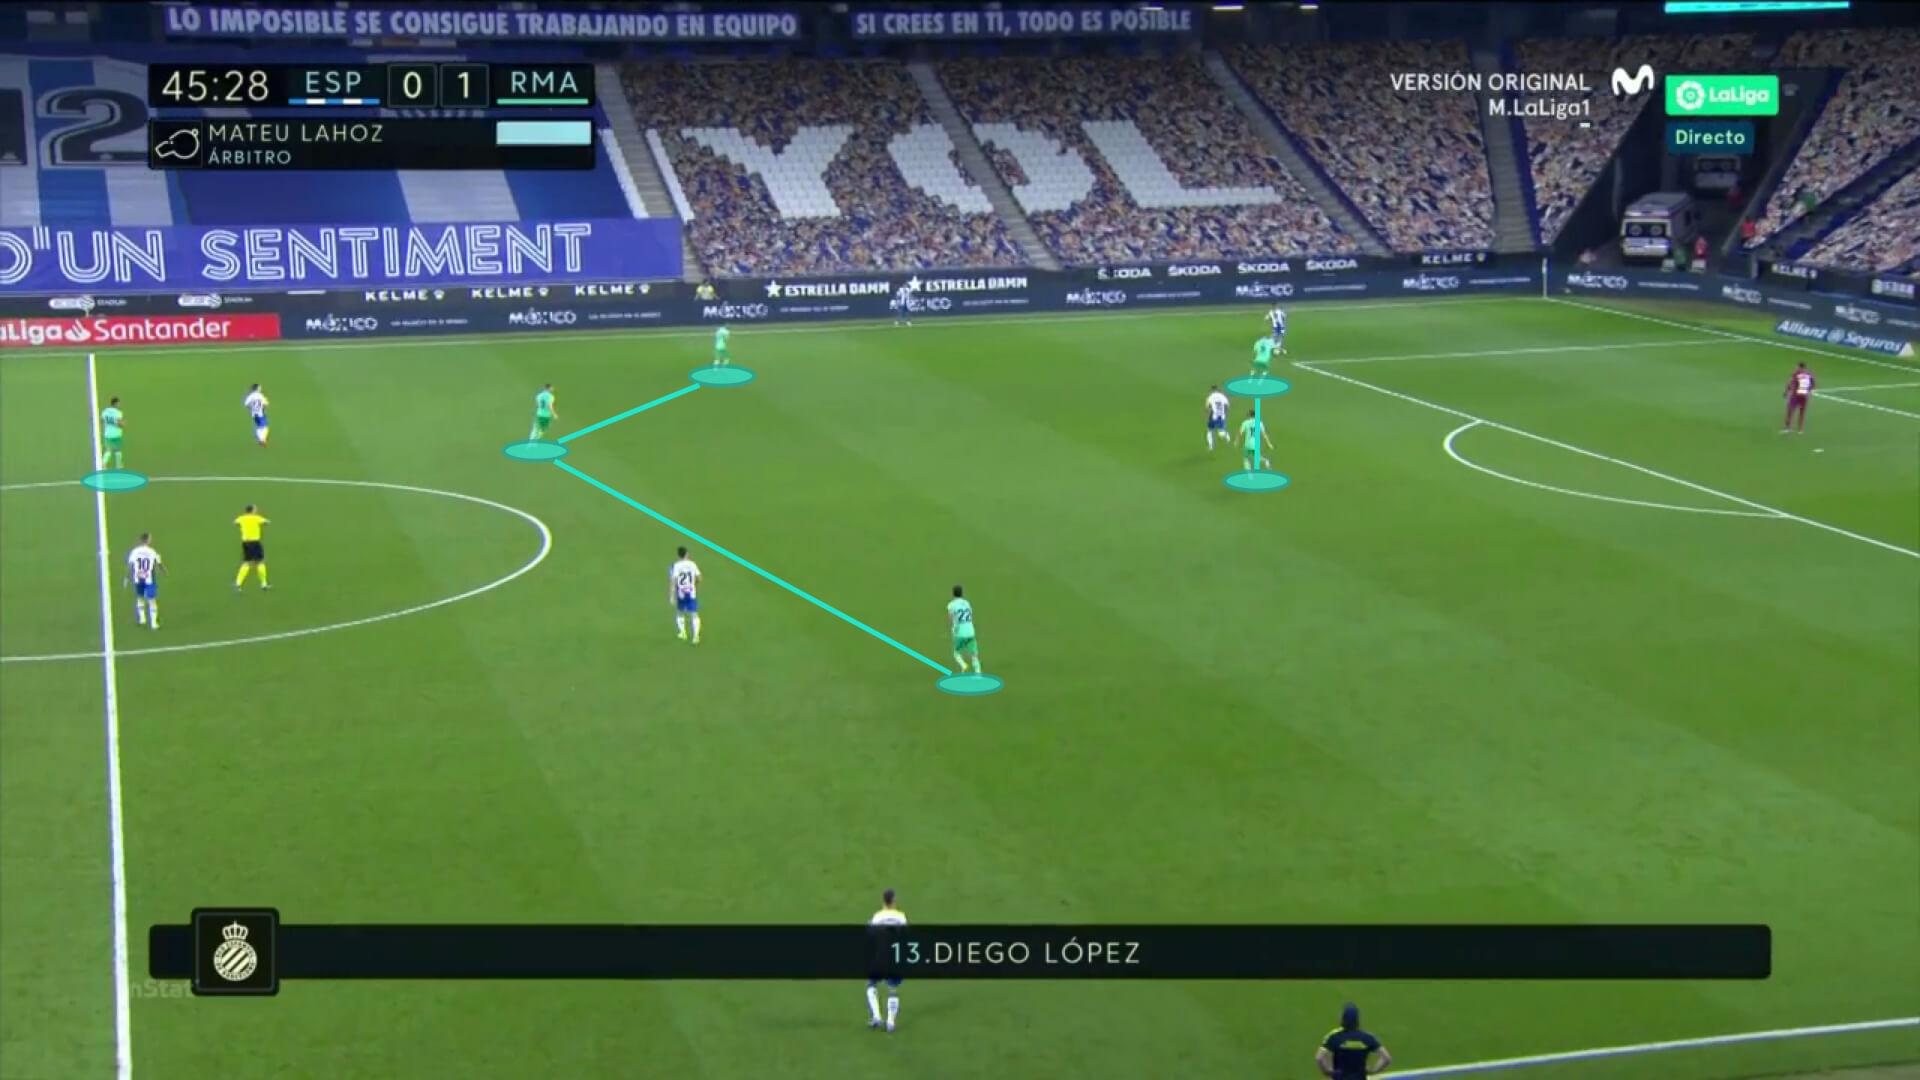 La Liga 2019/20: Espanyol vs Real Madrid - tactical analysis